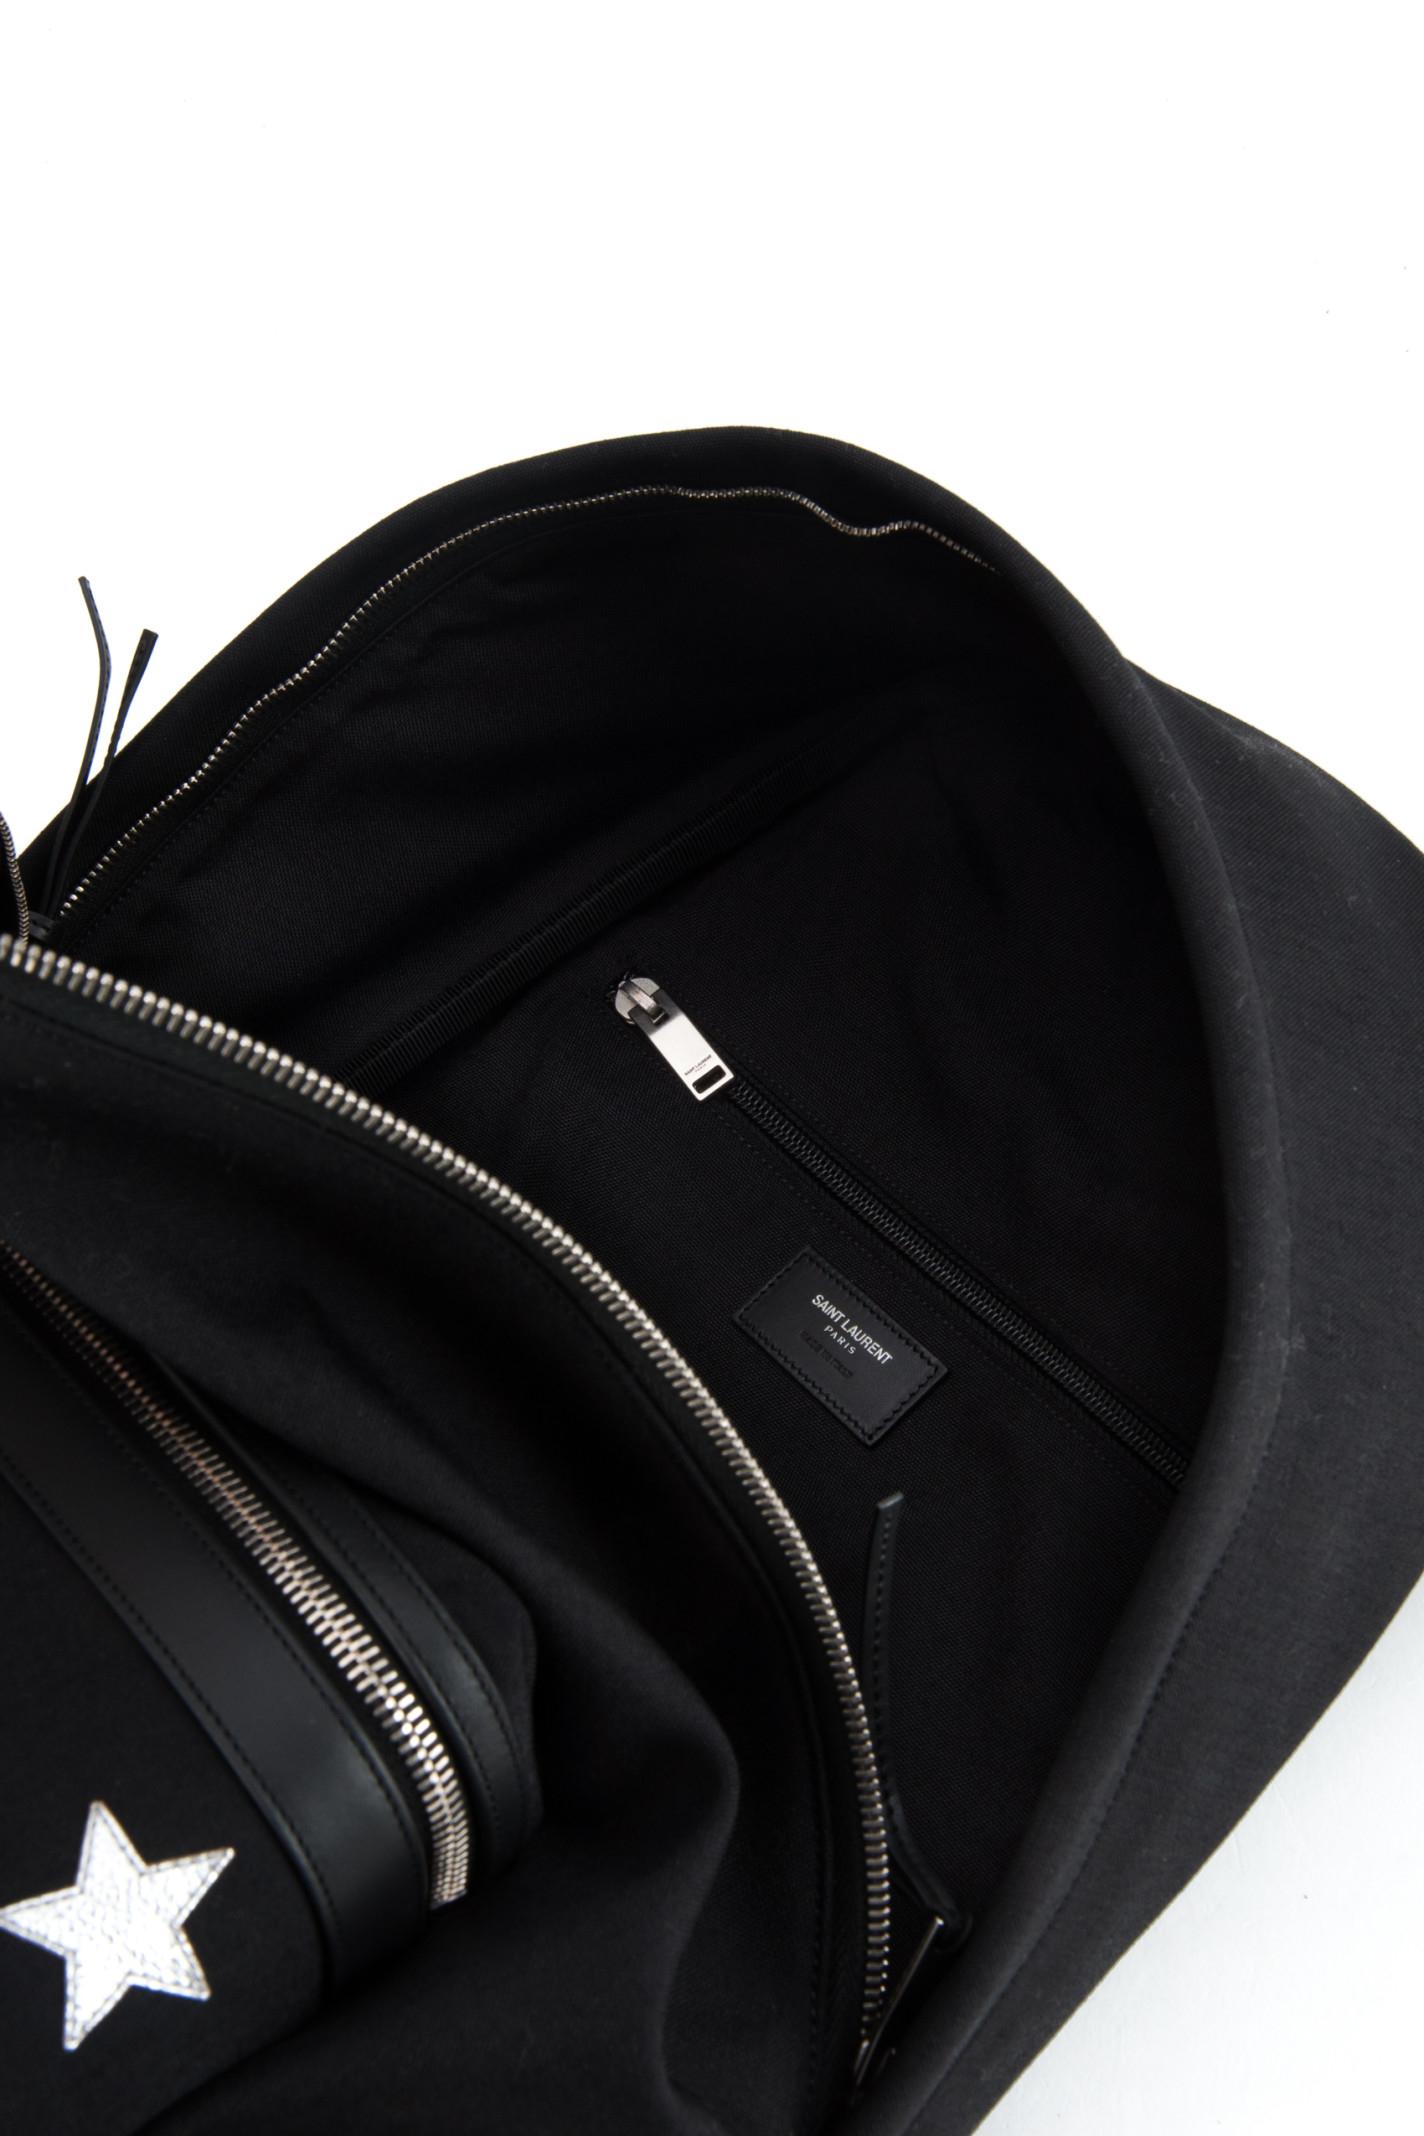 ysl baby duffle bag - ysl multicolour backpack